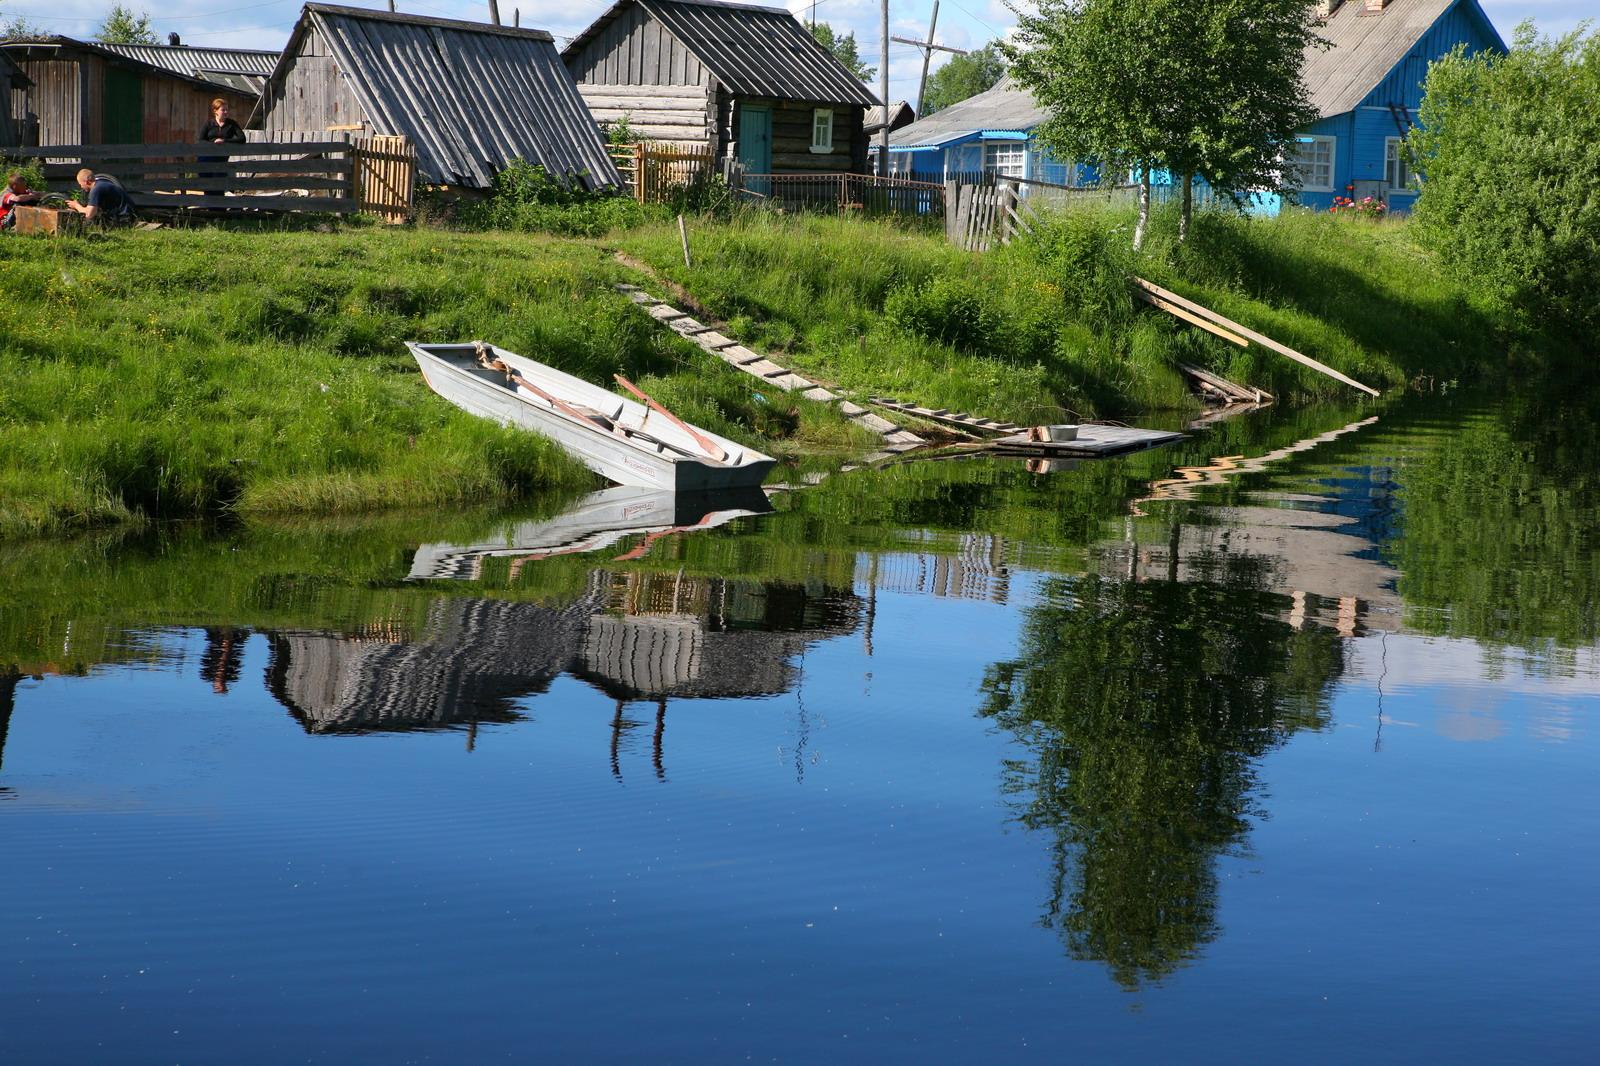 ... :: Фотографии Карелии :: фотография 2: basik.ru/photo_nature/karelia/15_karelia